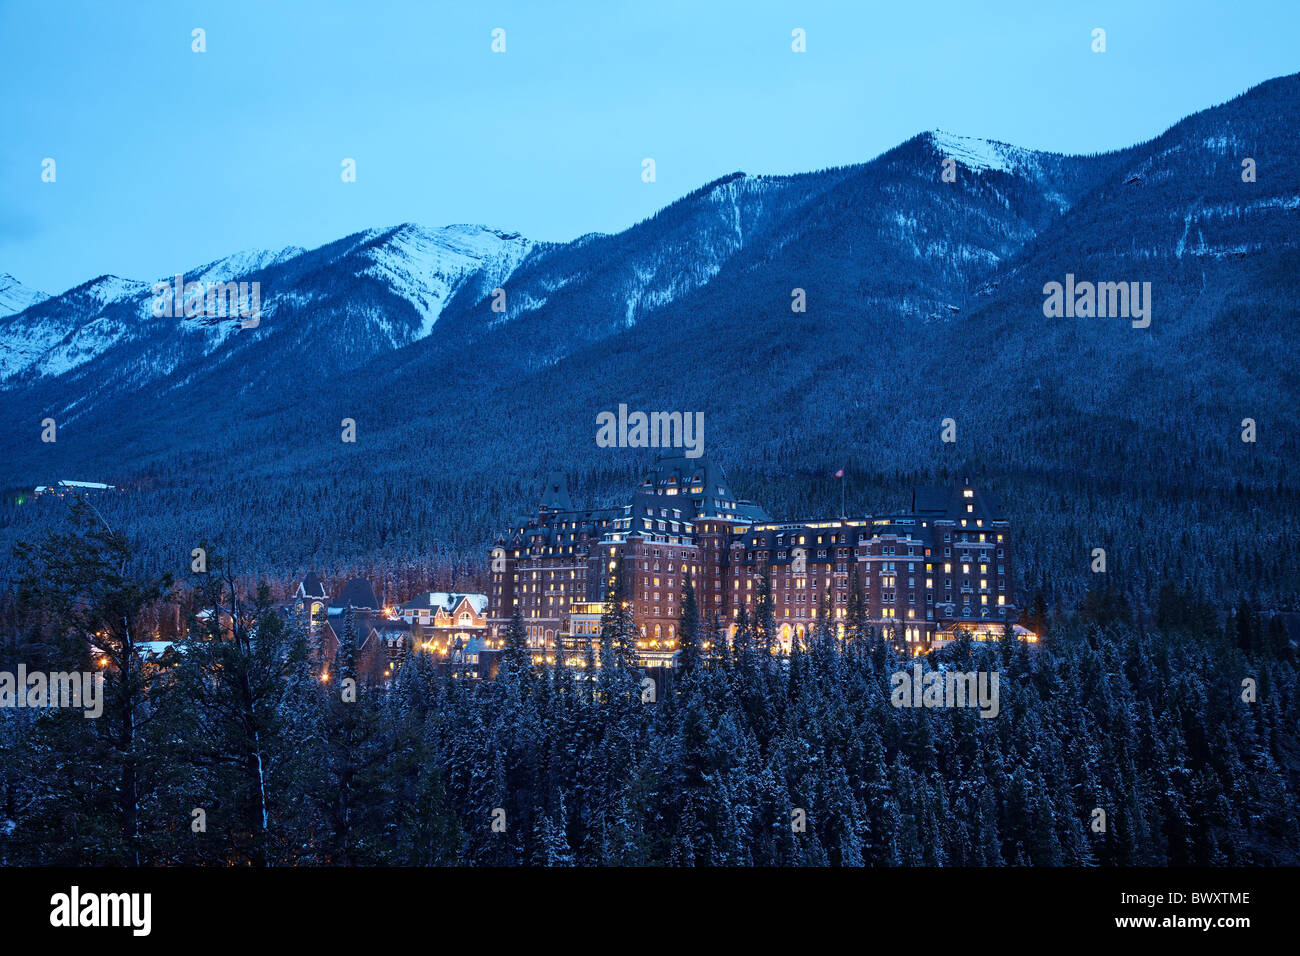 Banff Springs Hotel in late winter, Banff, Banff National Park, Canadian Rockies, Alberta, Canada Stock Photo